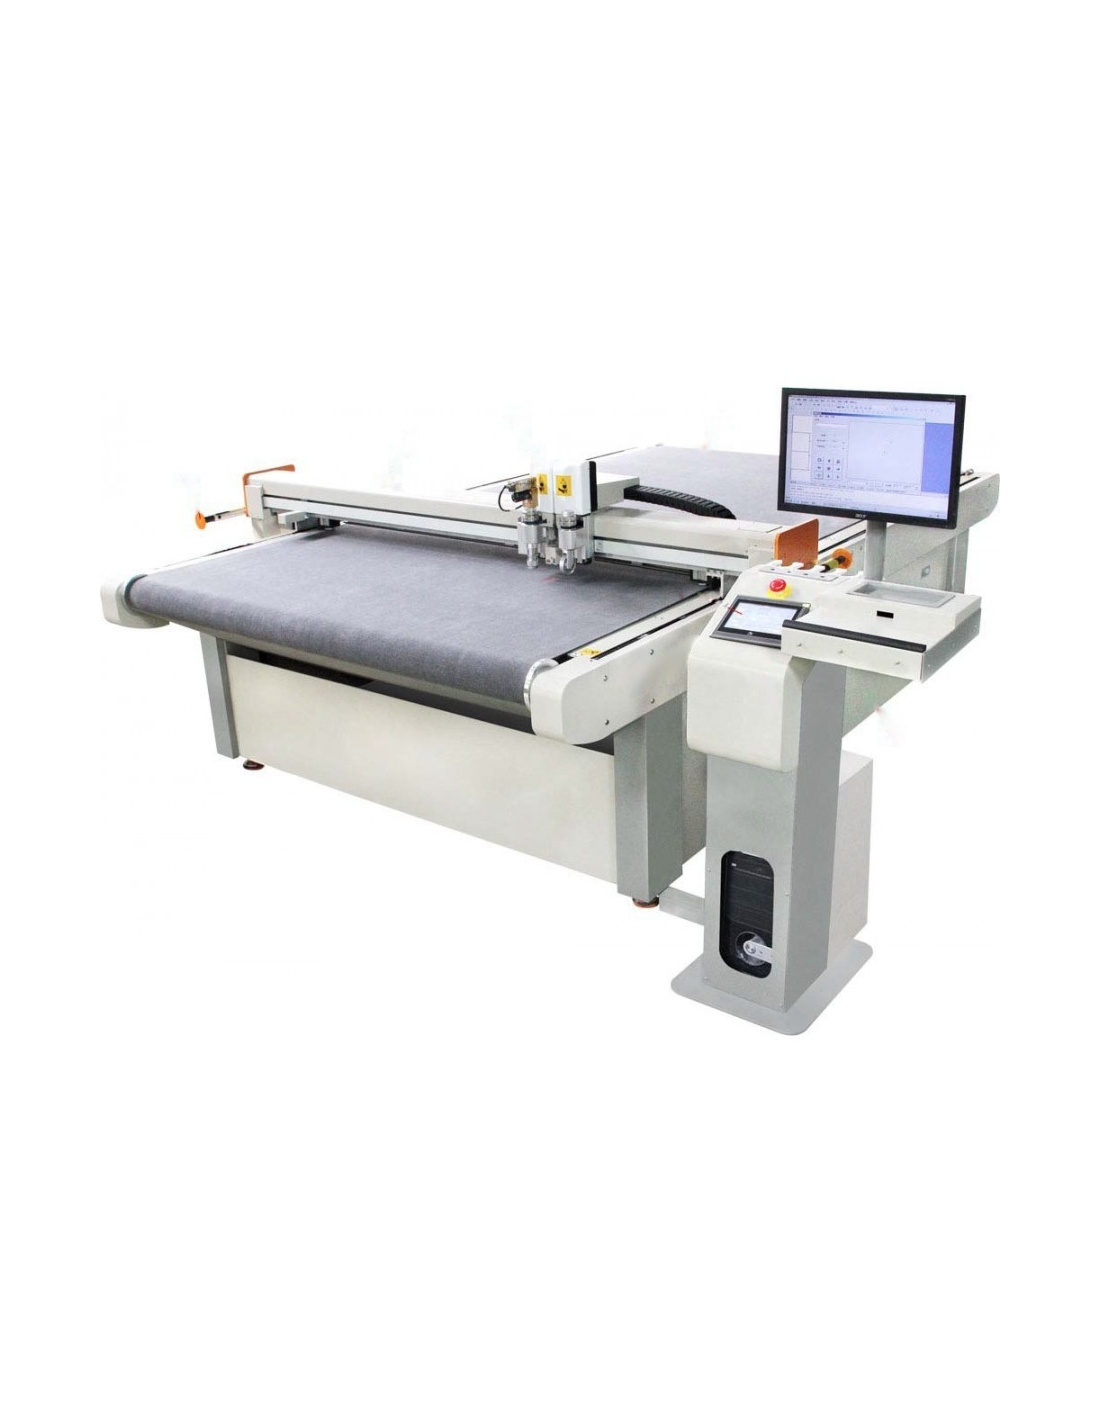 Cutting plotter CNC Winter PlotterMax 2030 AllRounder